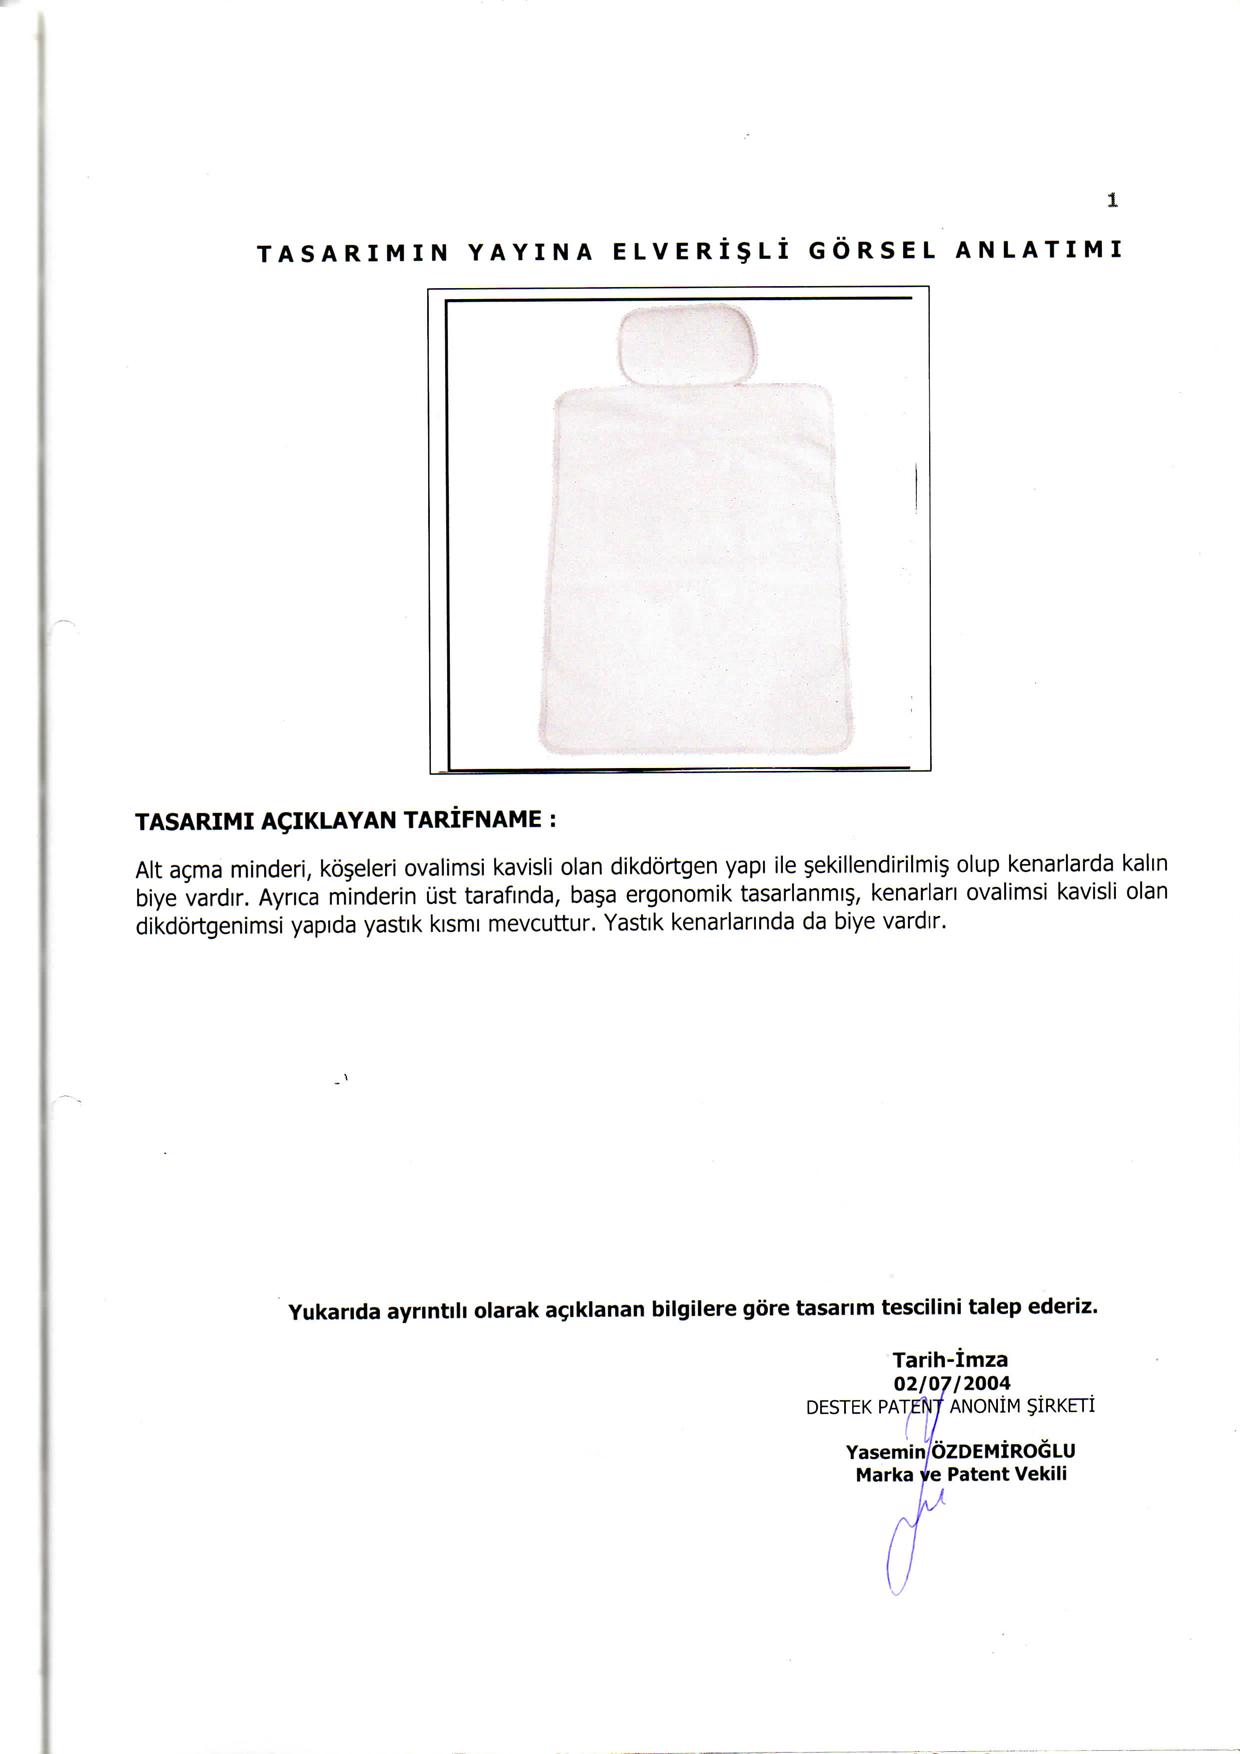 Pratik Alt Açma Minderi Patent 2